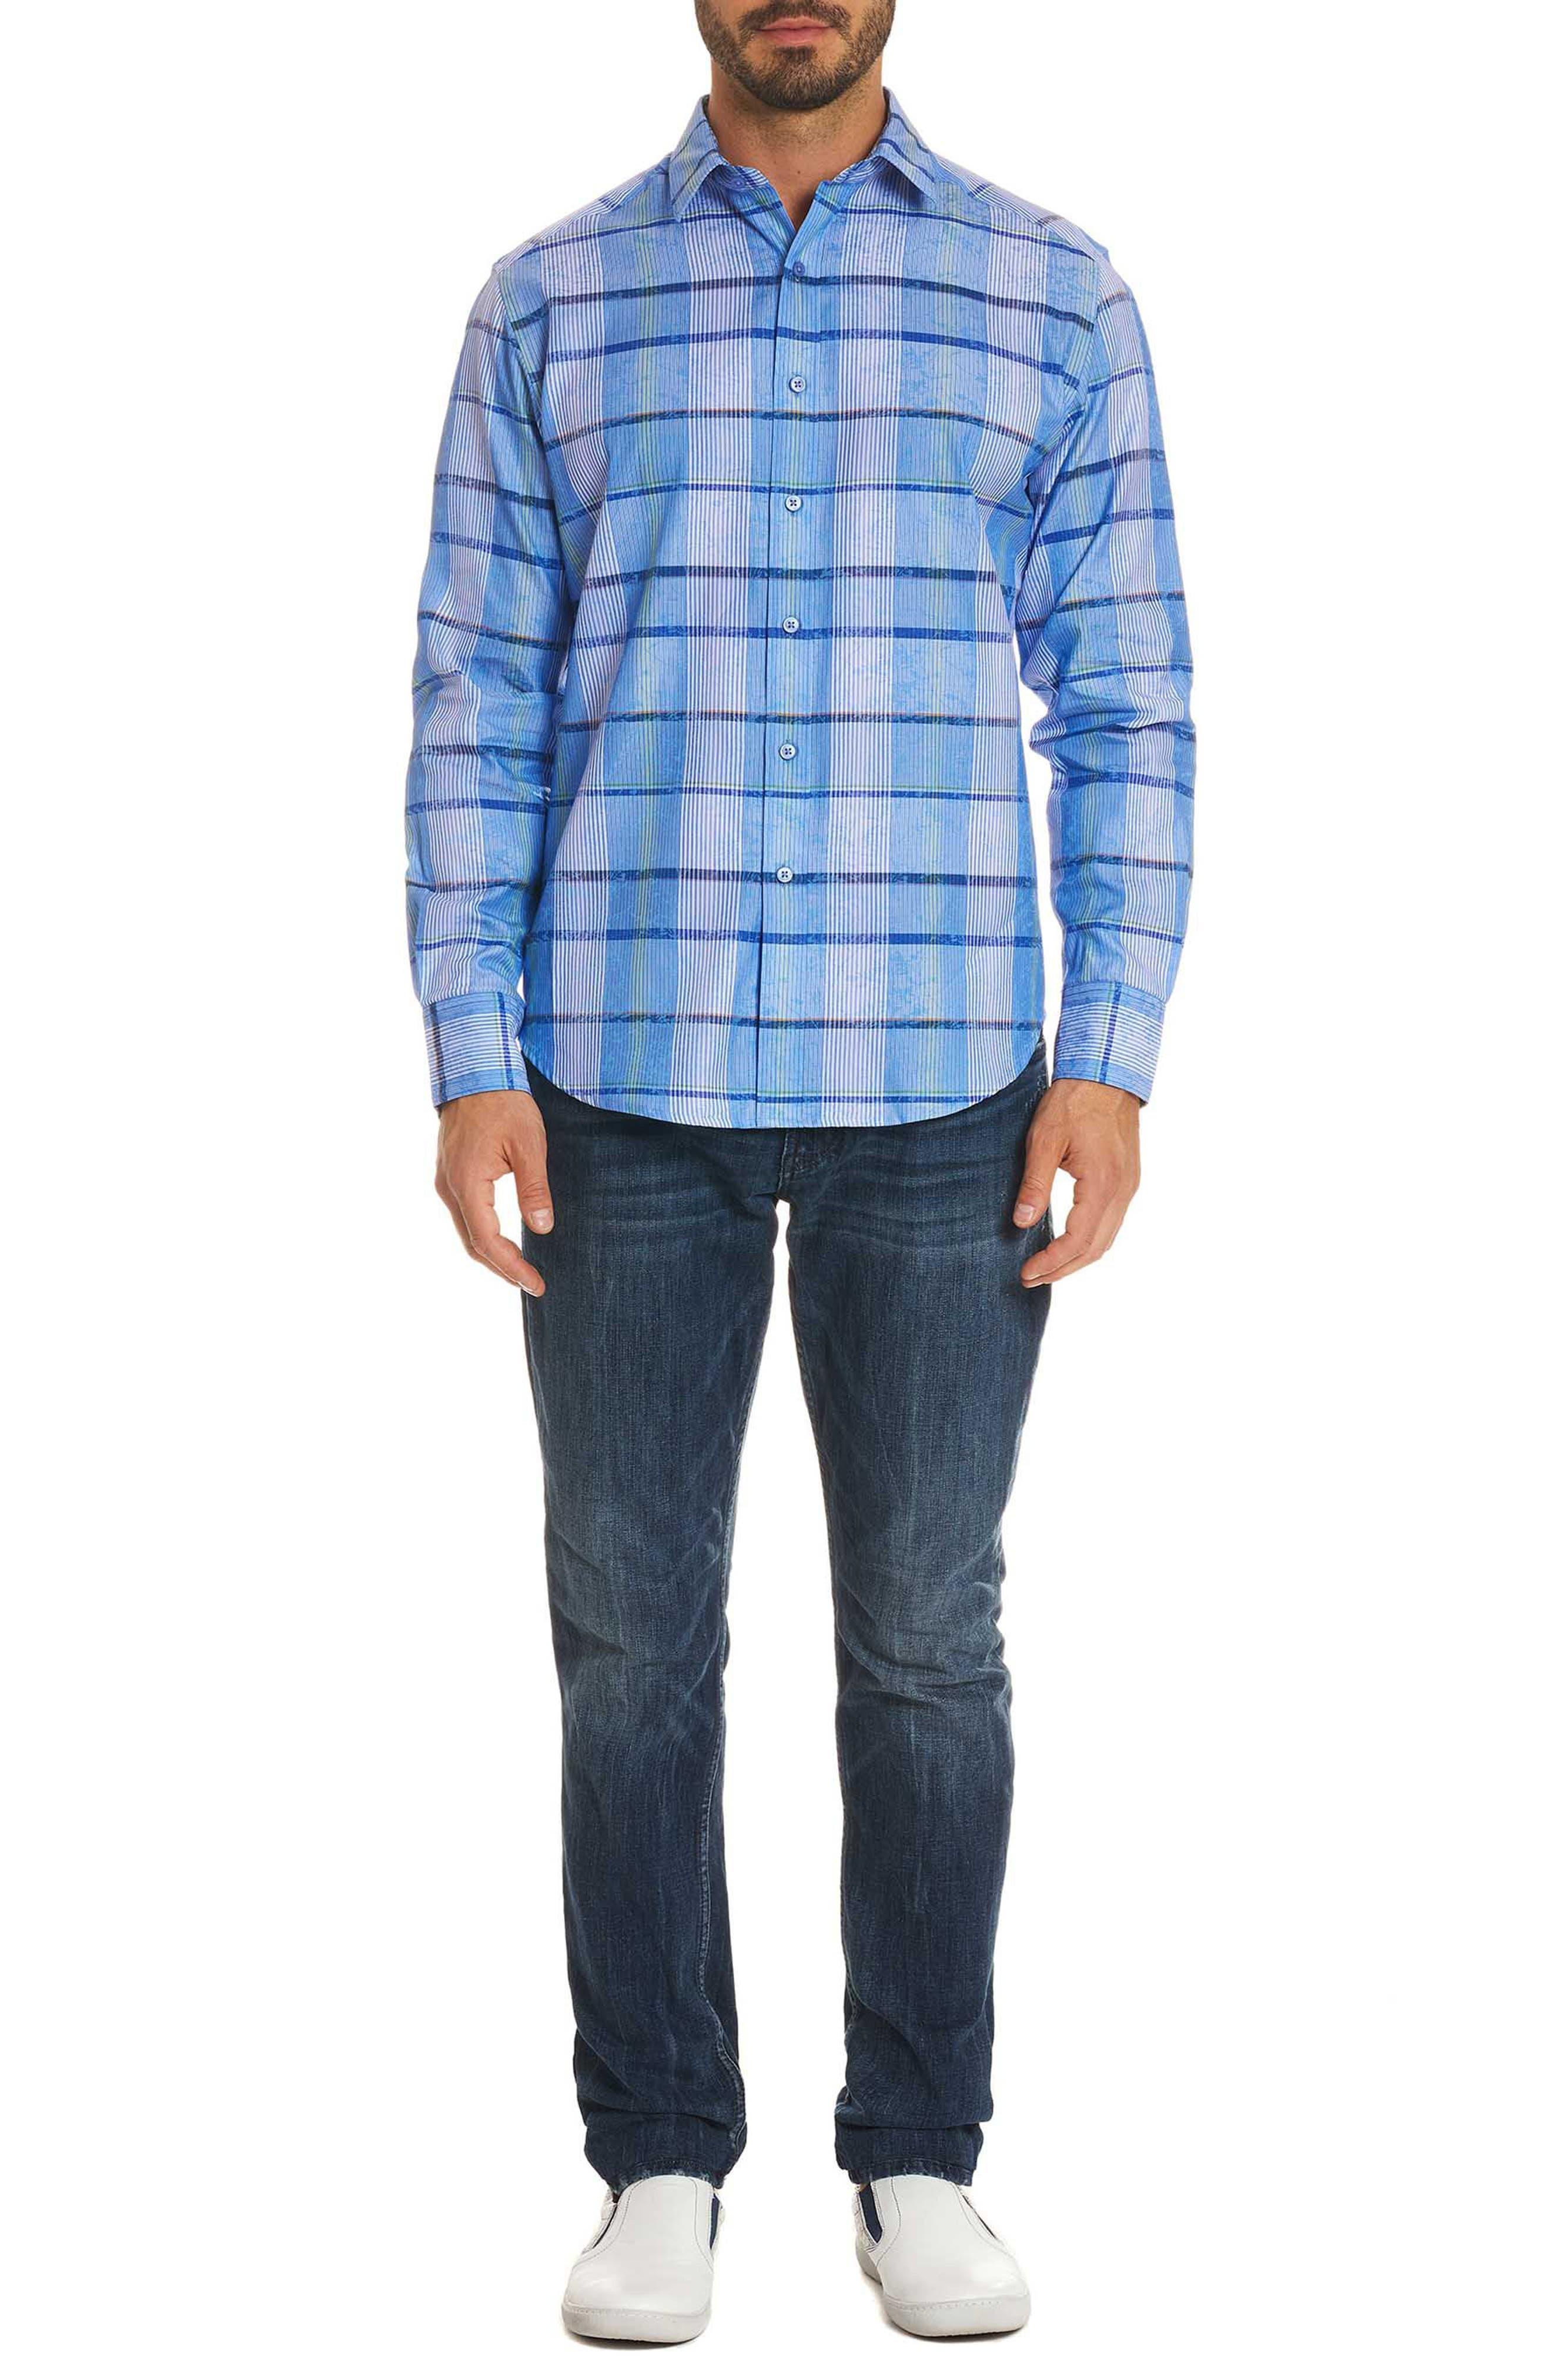 Ferro Classic Fit Sport Shirt,                             Alternate thumbnail 7, color,                             Blue